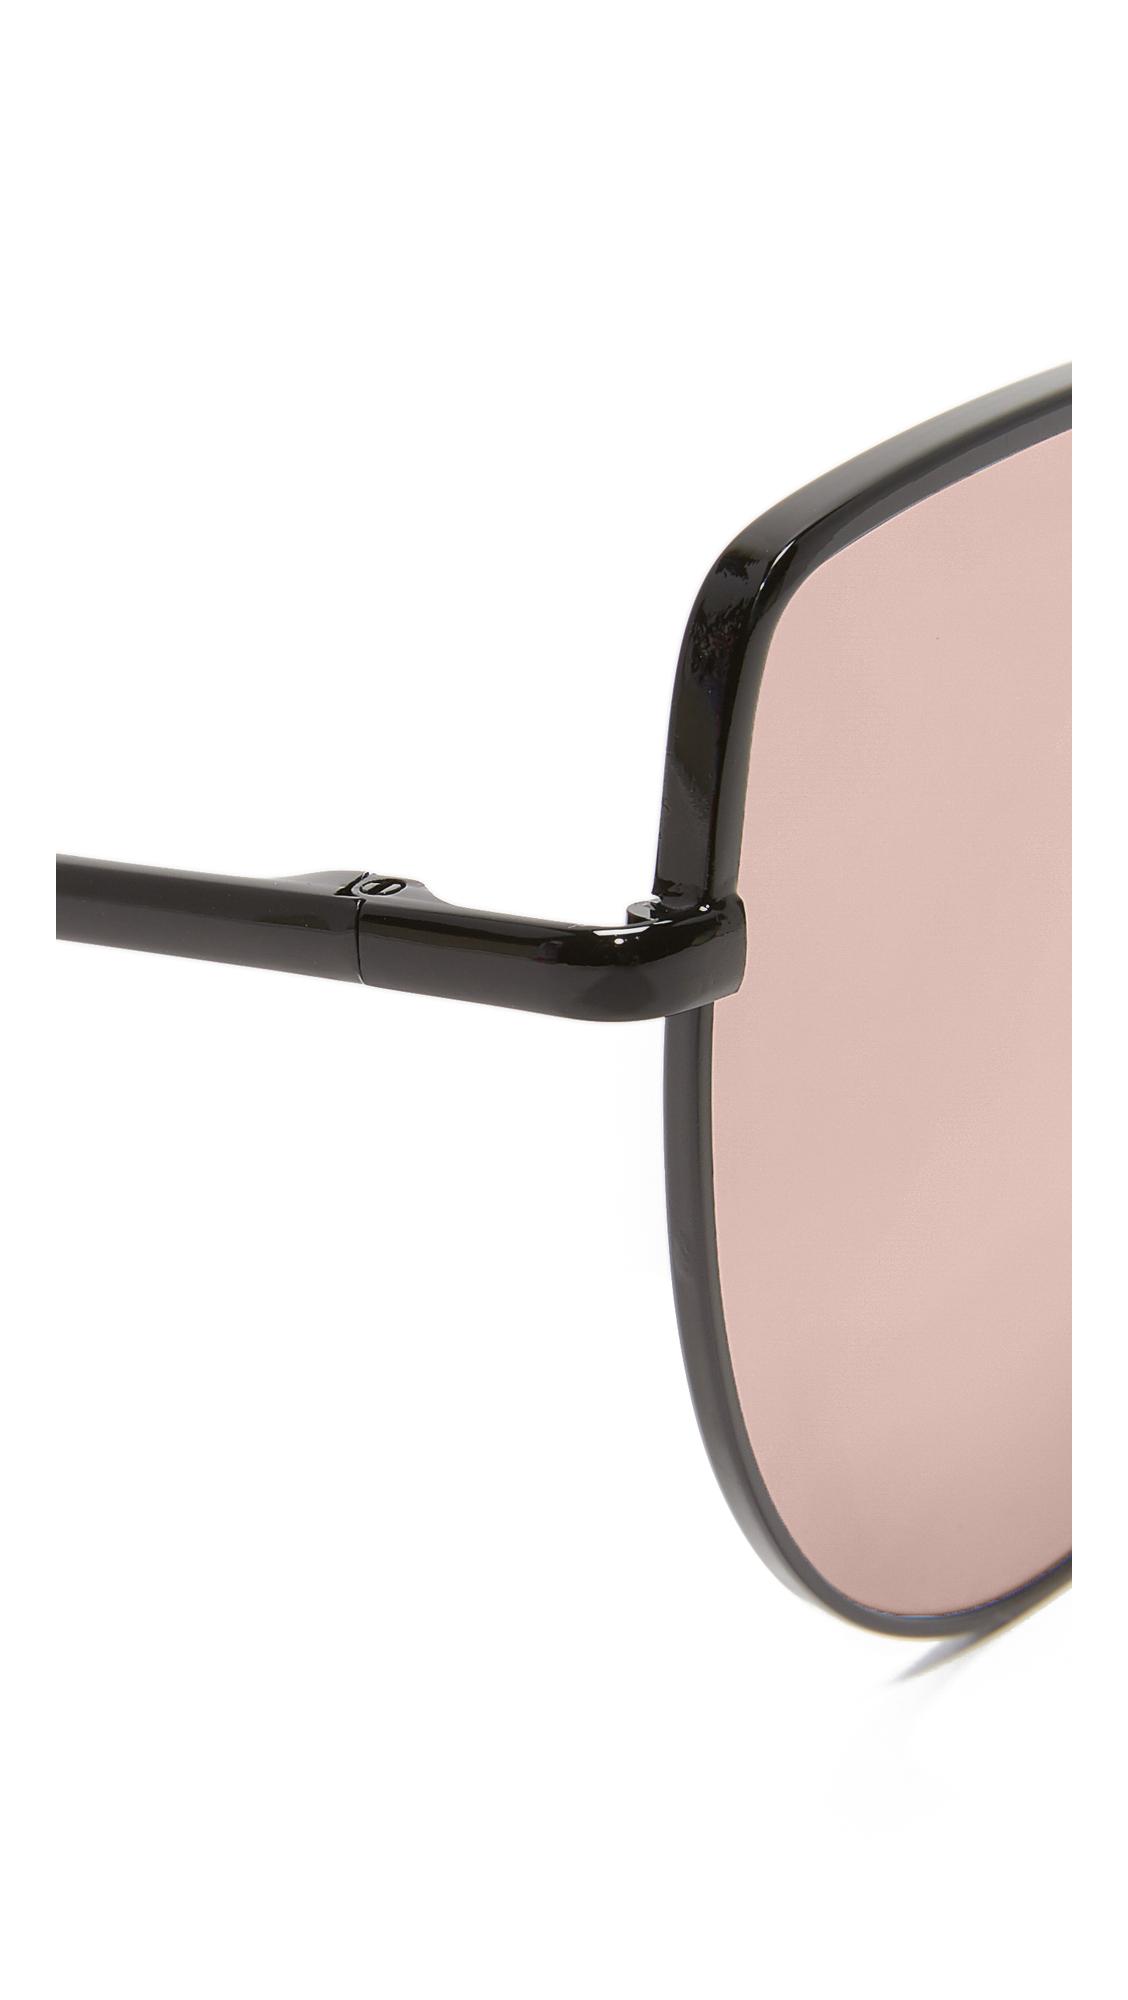 b4bd5adc16aaa Quay Santa Fe Sunglasses